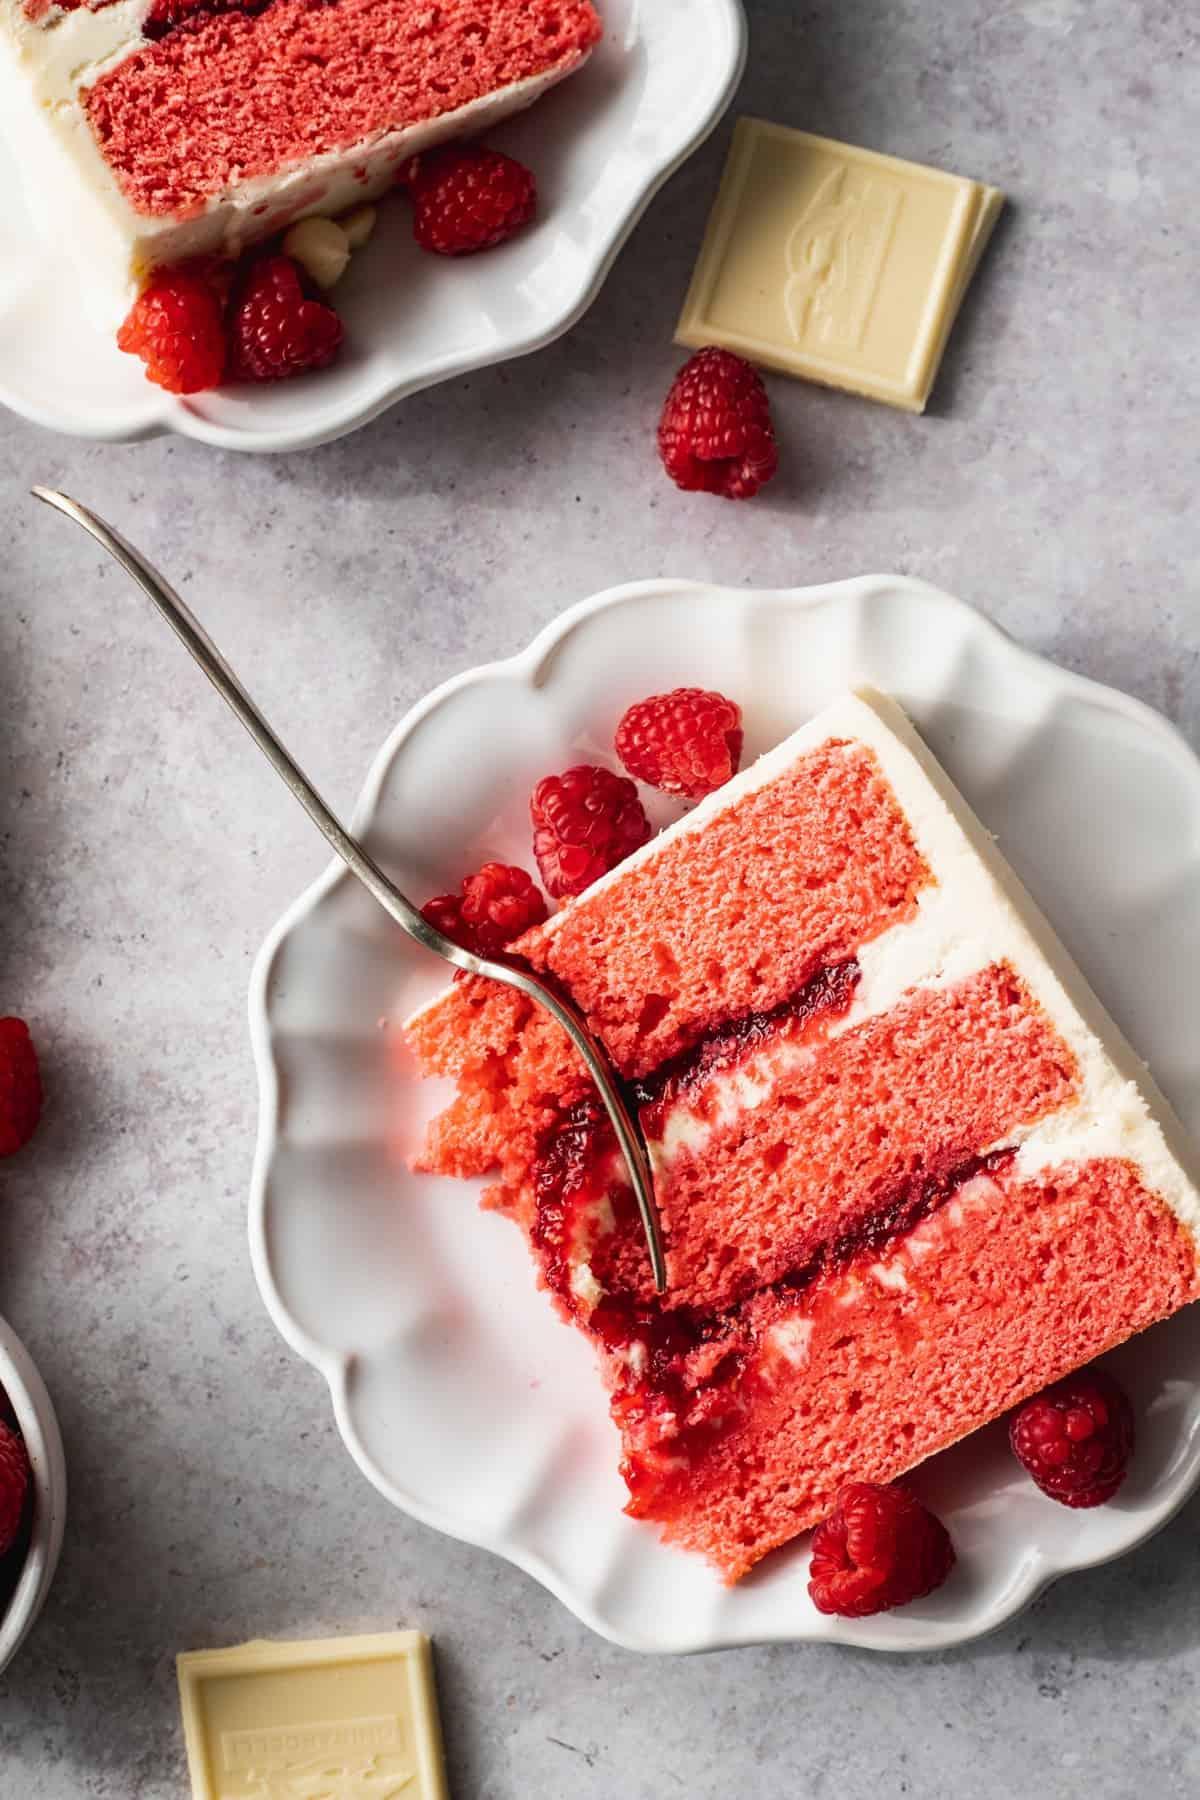 Raspberry white chocolate cake on a plate.